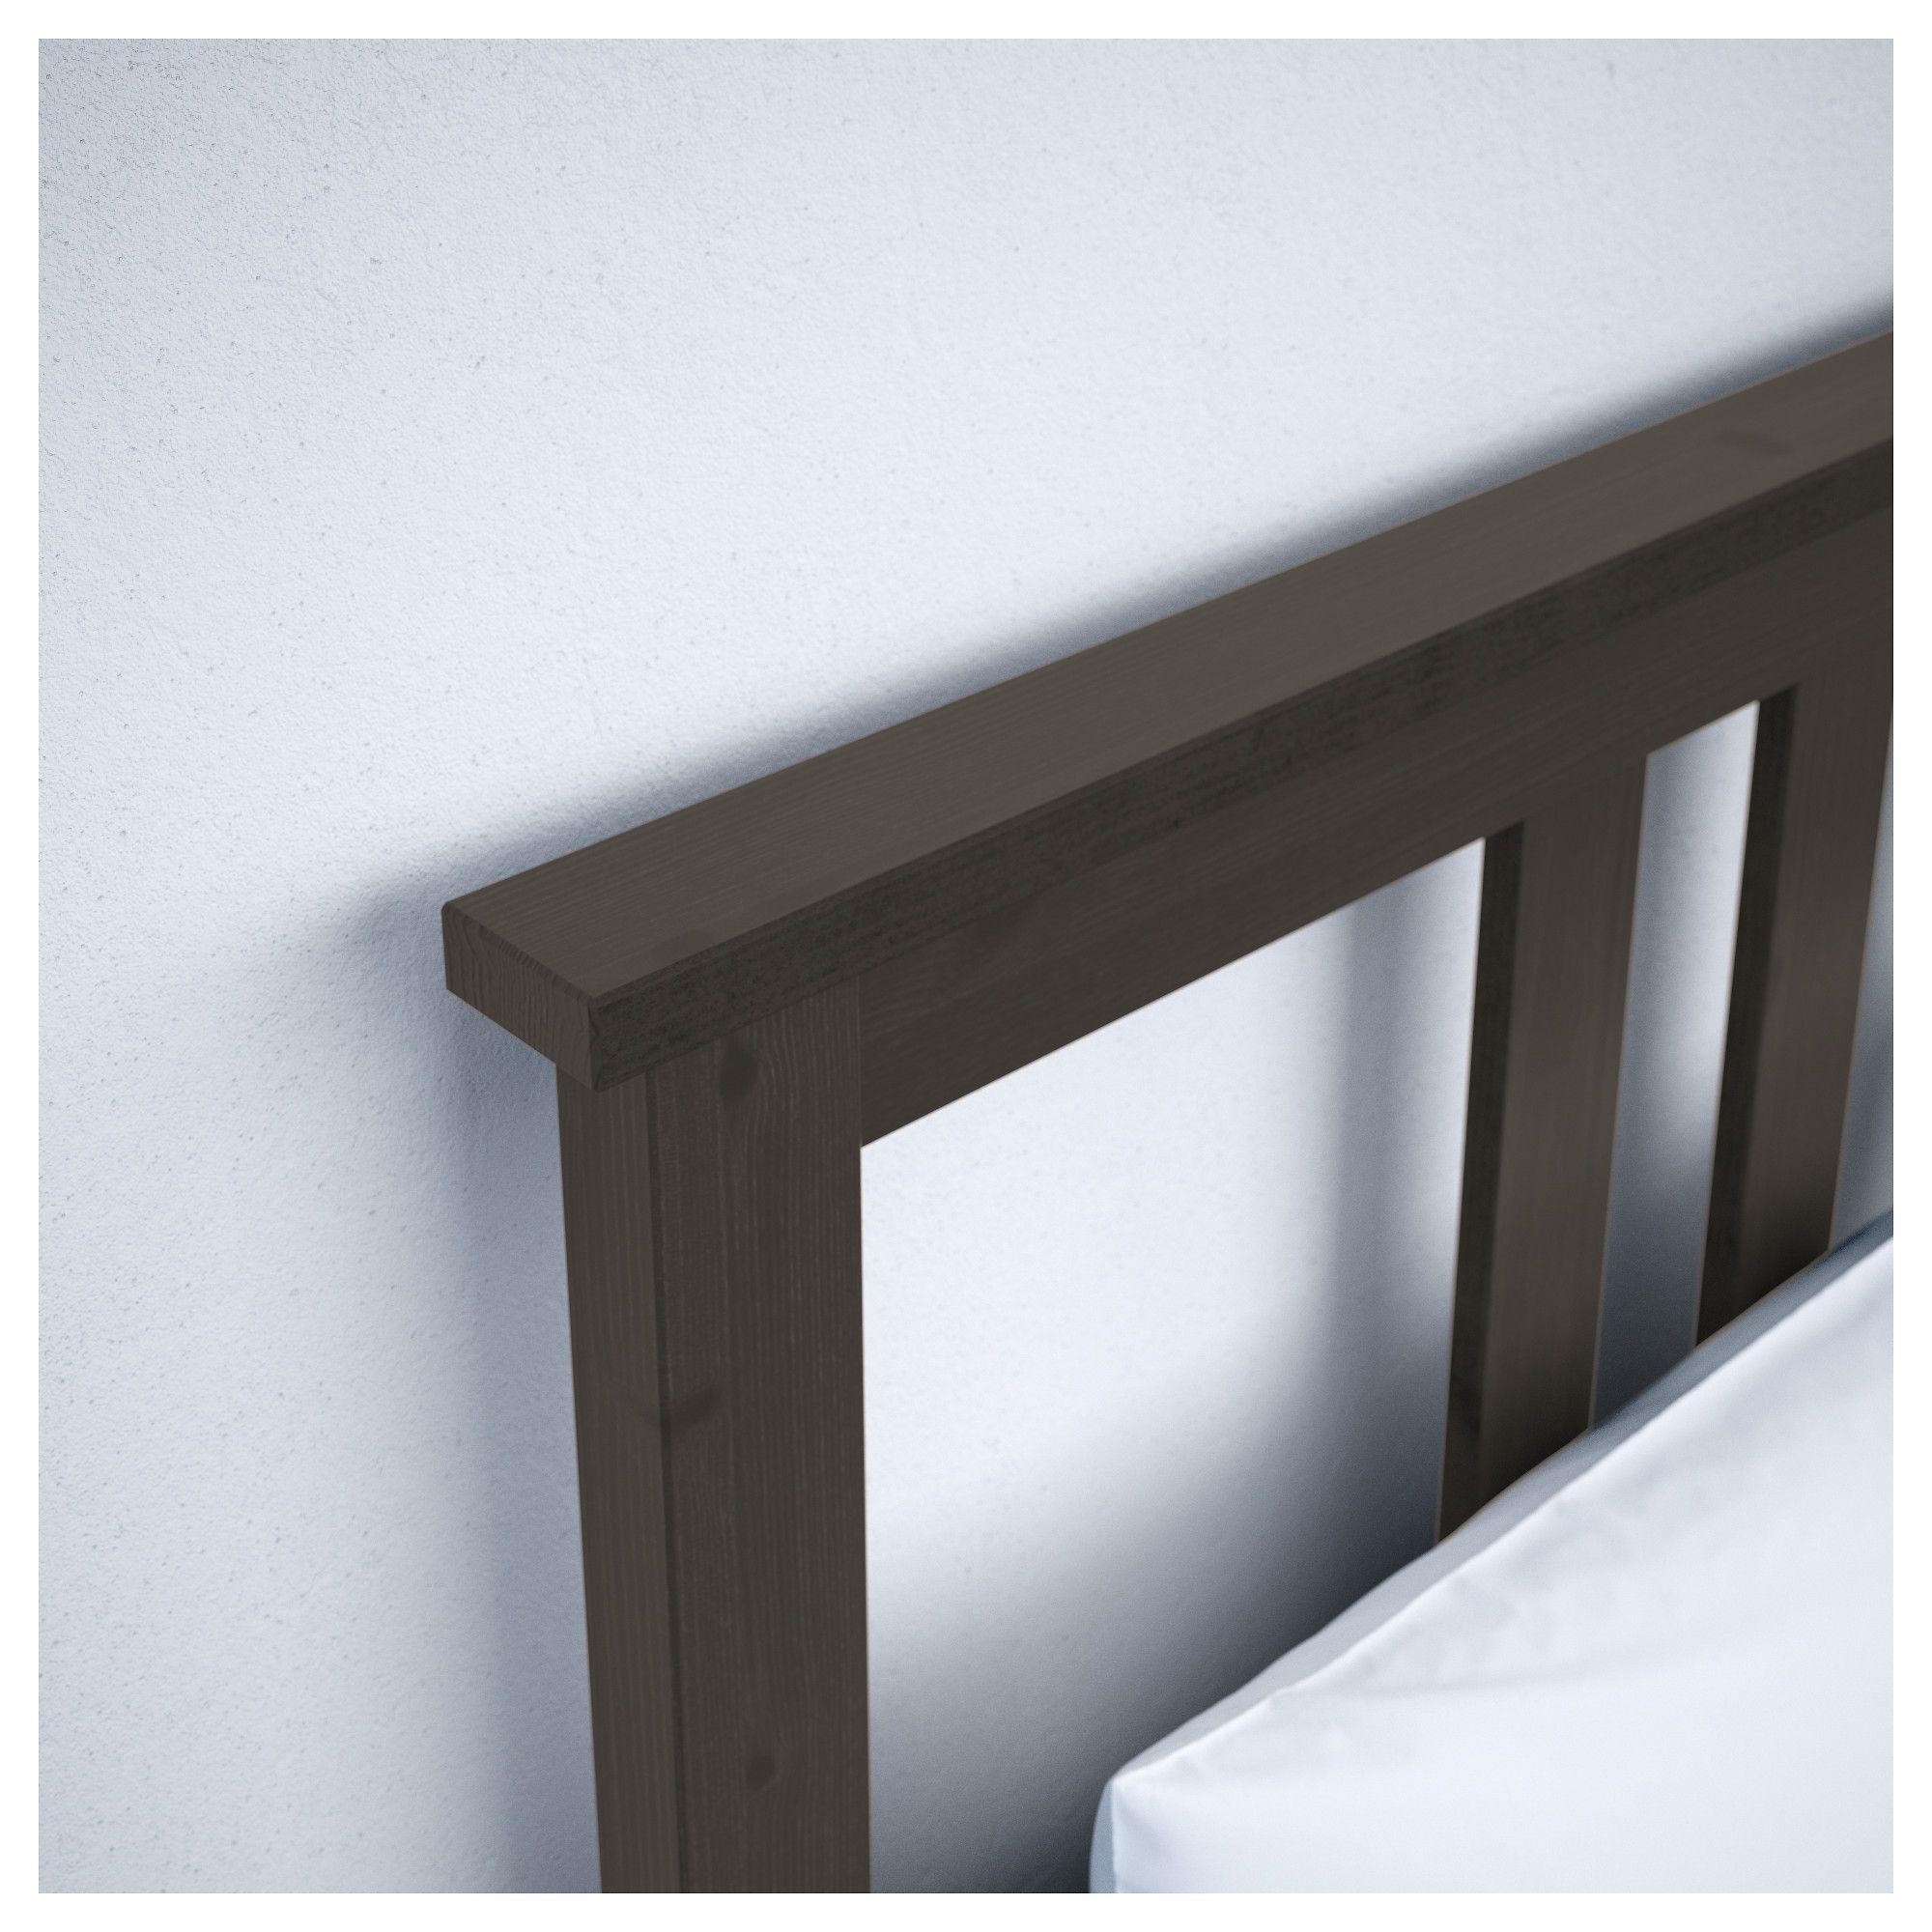 Hemnes Bed Frame With 4 Storage Boxes Black Brown Espevar Products